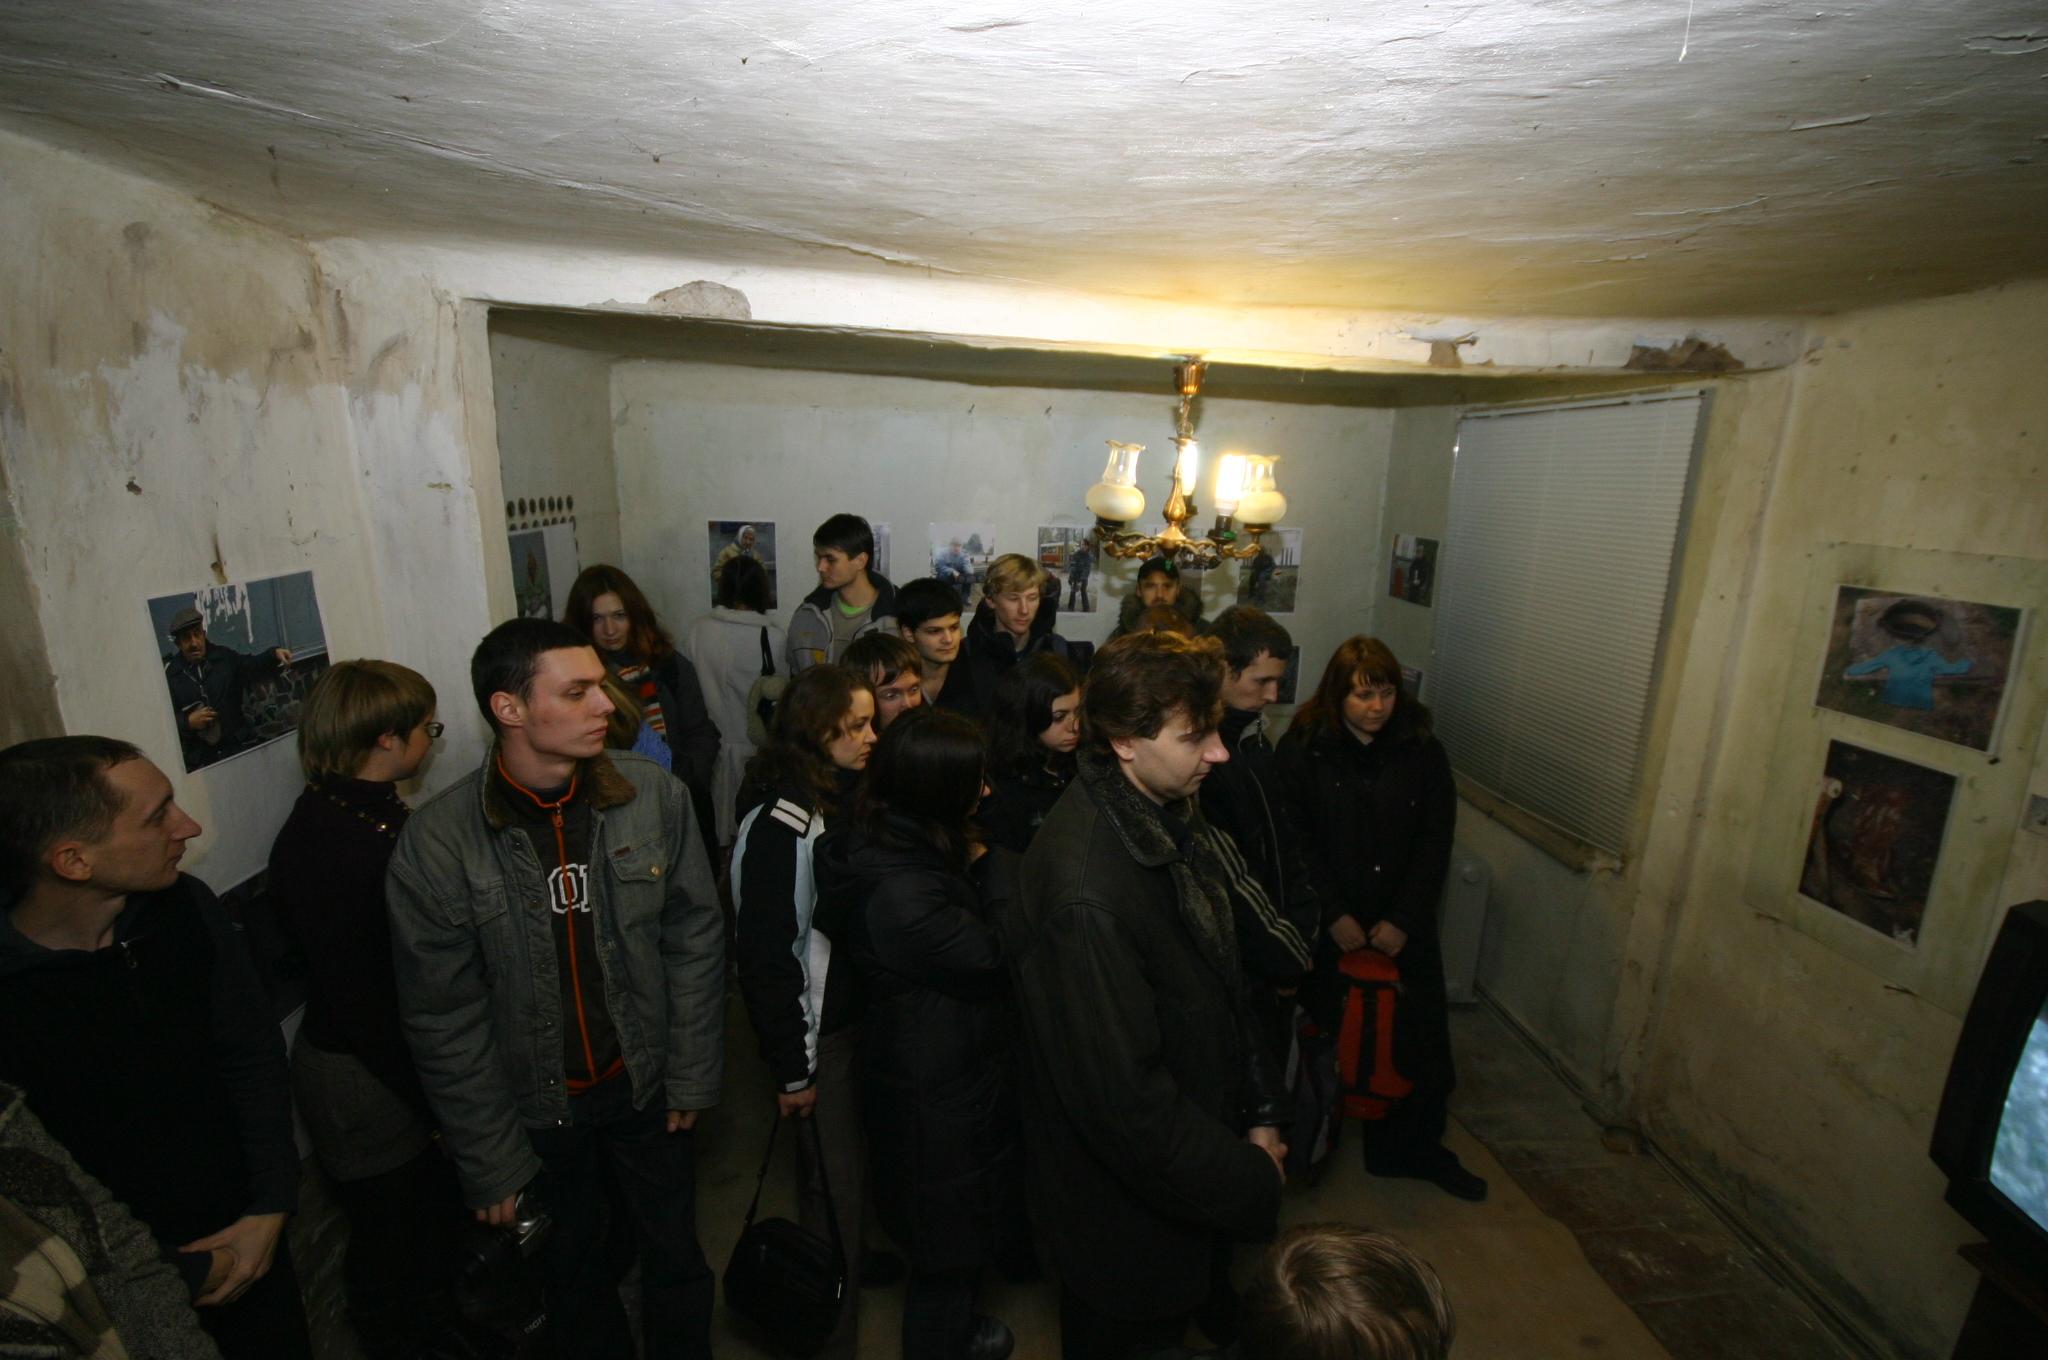 Галерея-лаборатория SOSка. Выставка Сергея Попова. 2007